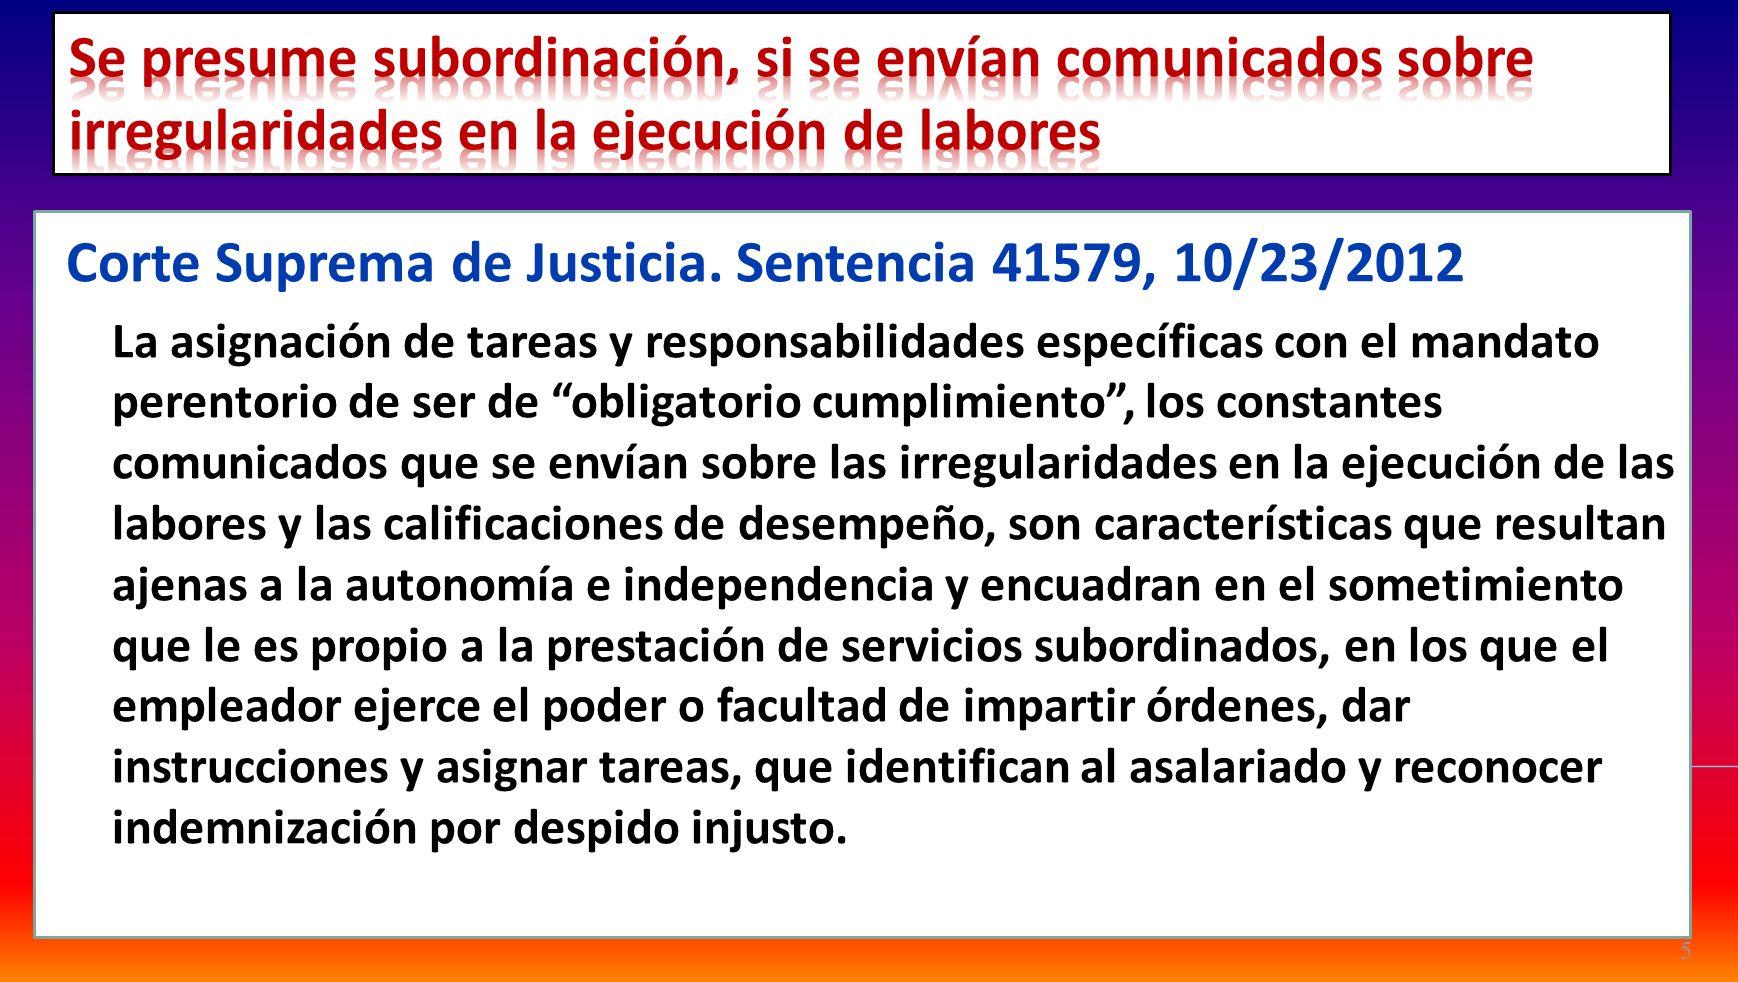 Ley 1393/10.Art. 30.